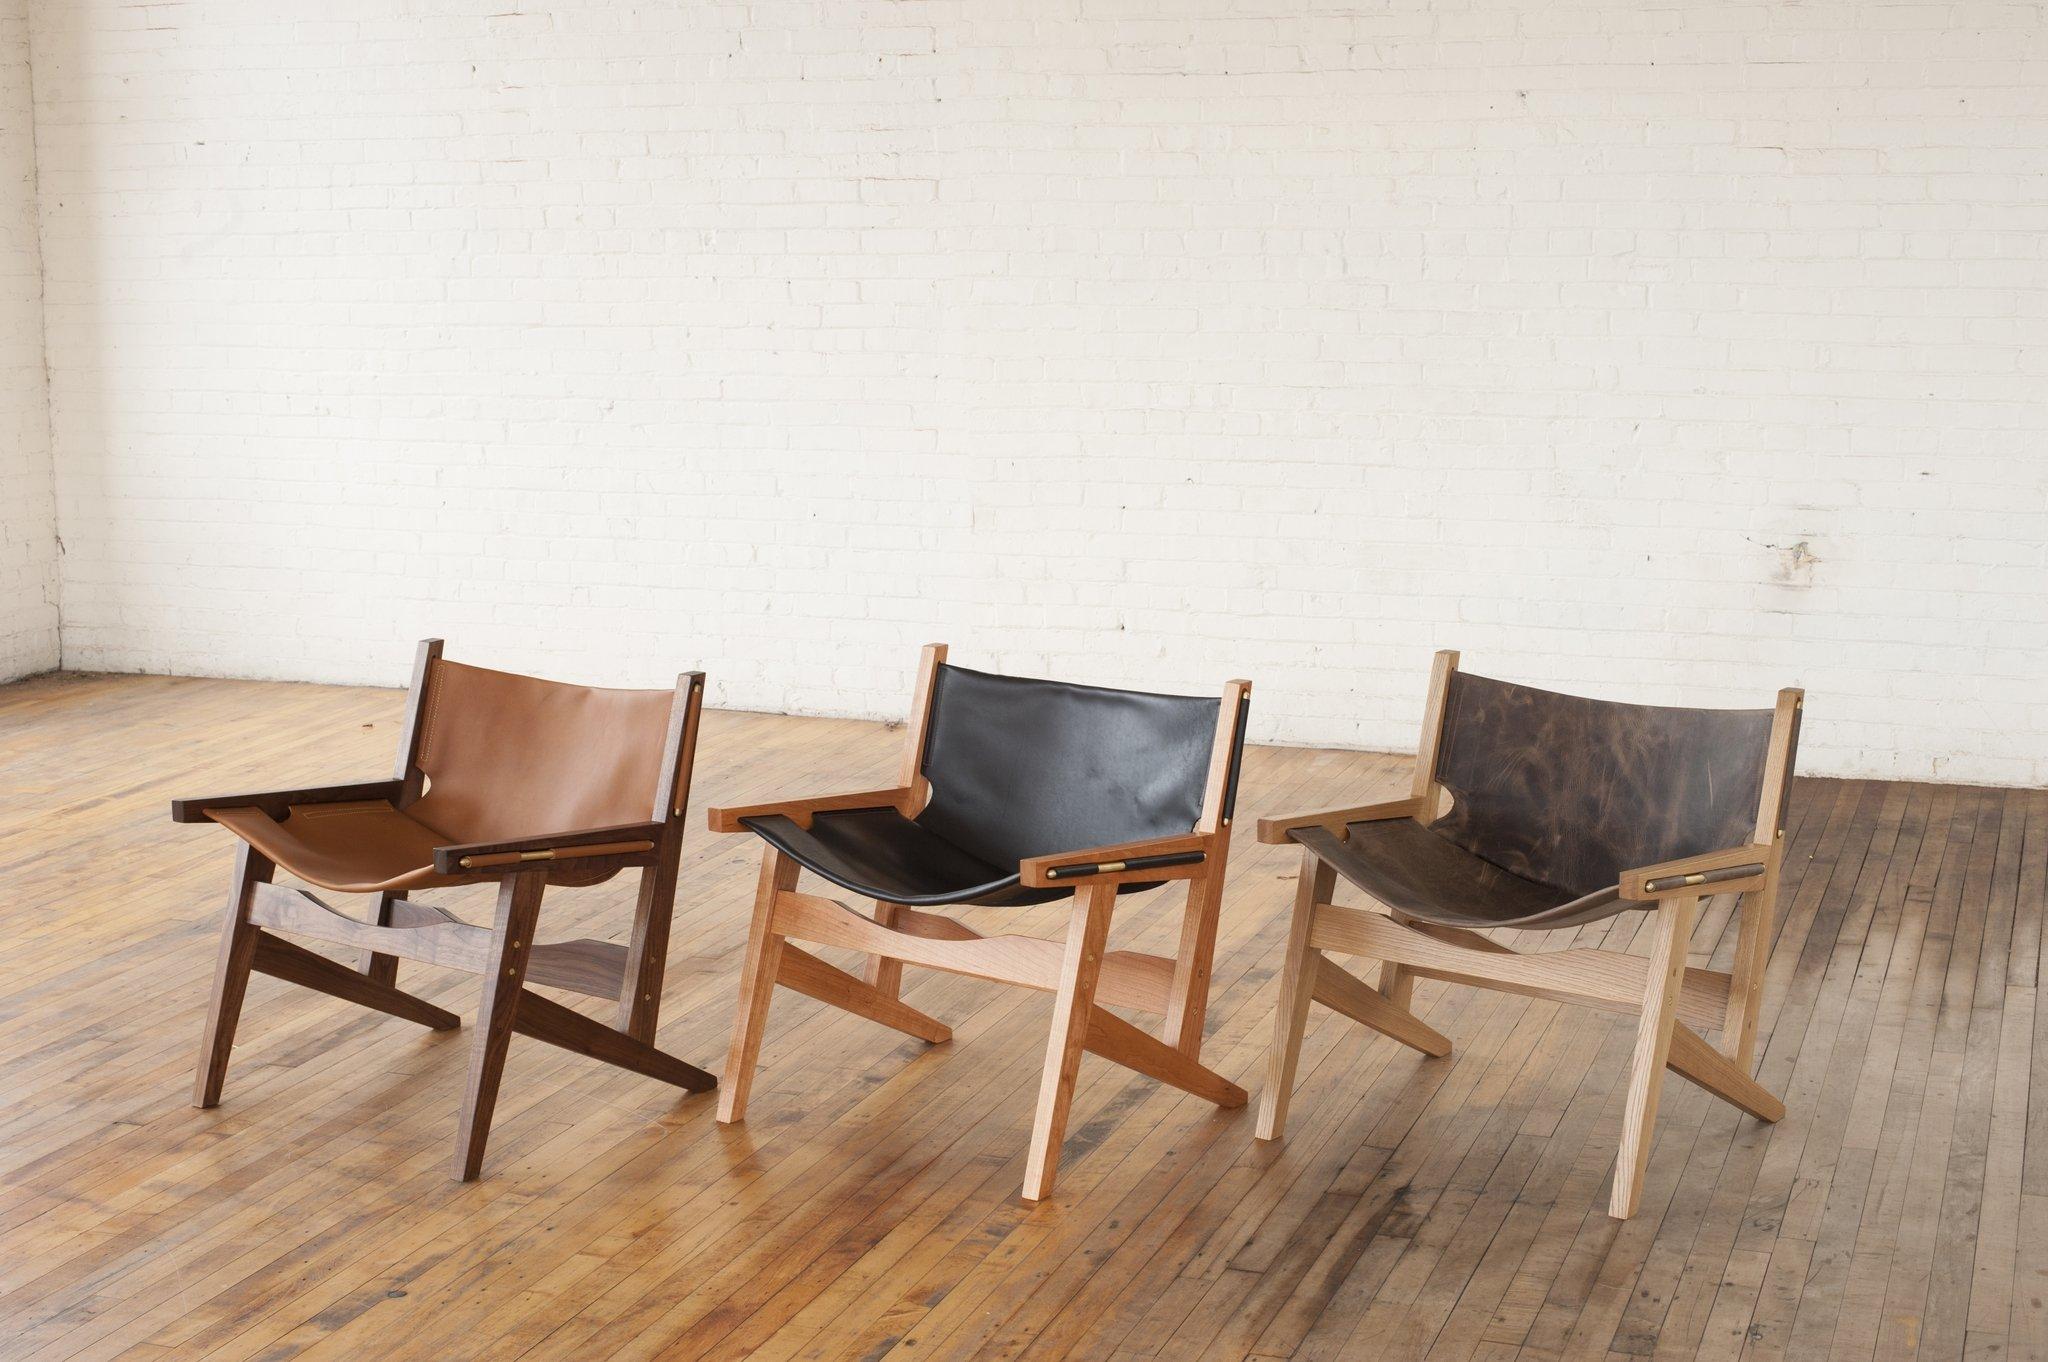 Three Peninsula Chairs by Ben Klebba of  Phloem Studio , co-designer of Room 3 at The Jennings Hotel